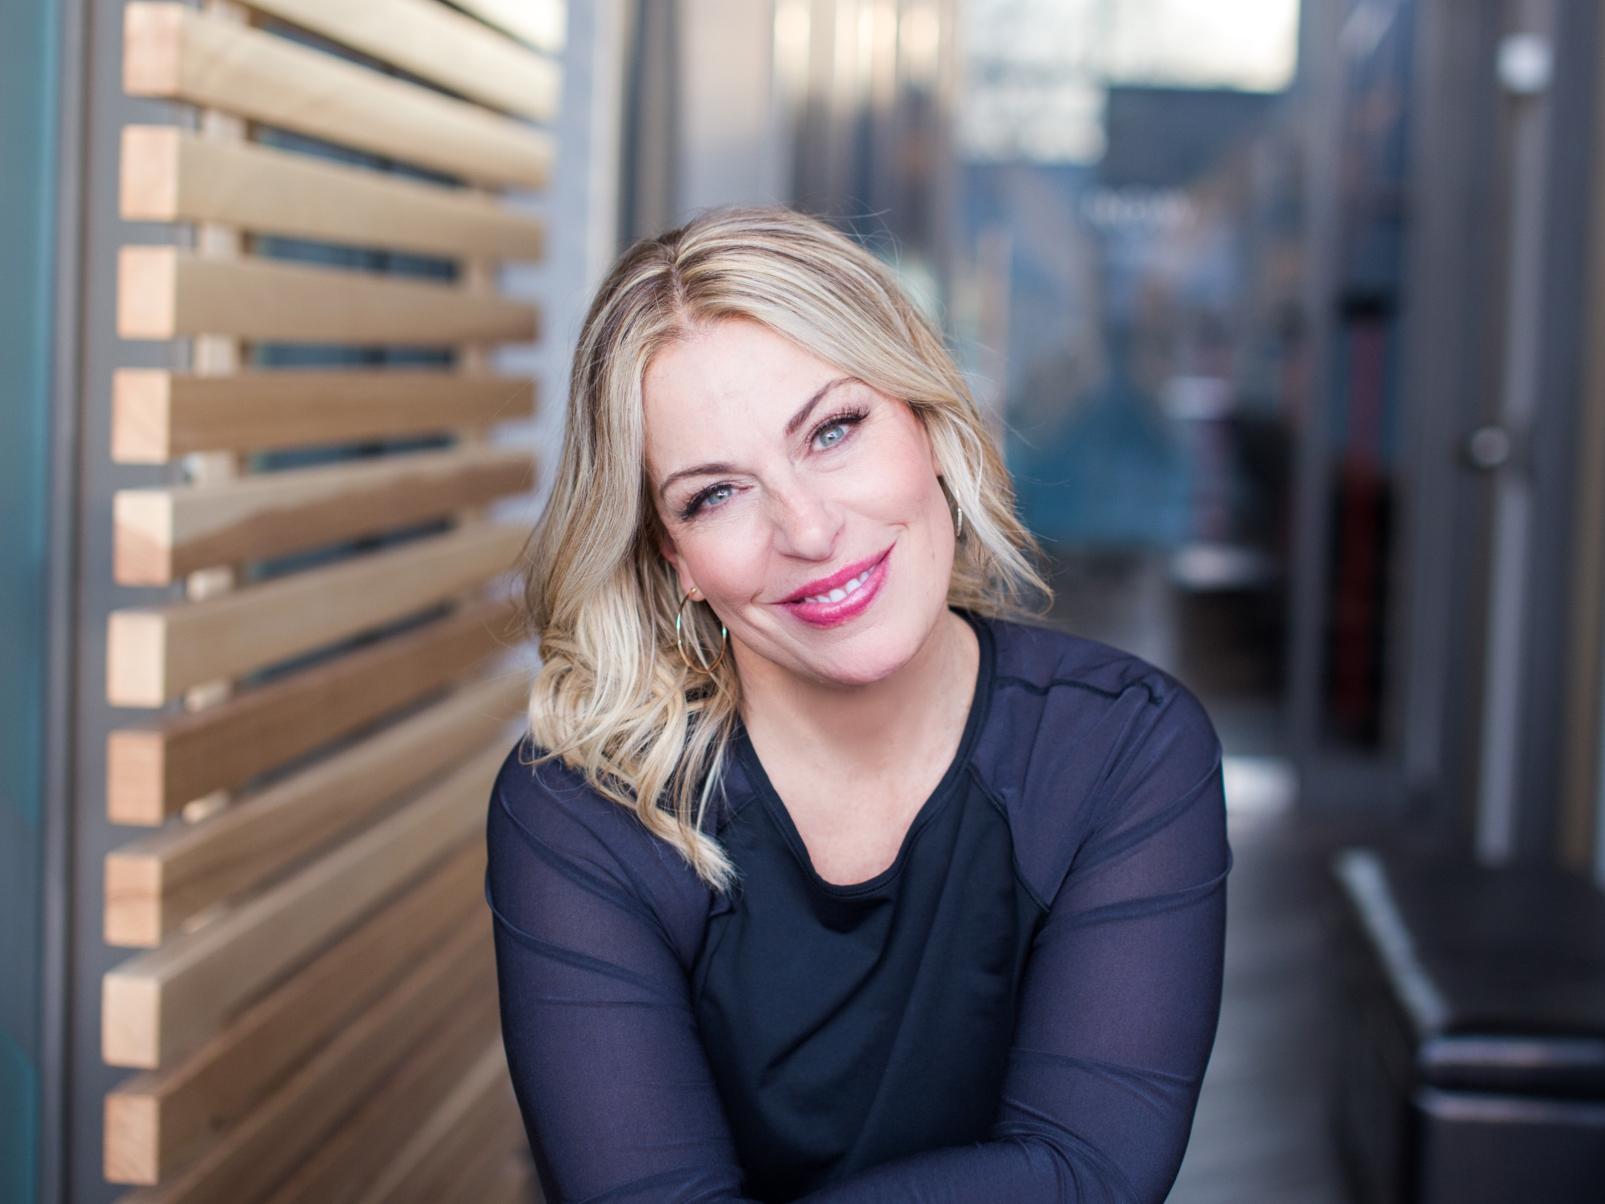 Heather Pugh, Founder of the REFORM Method